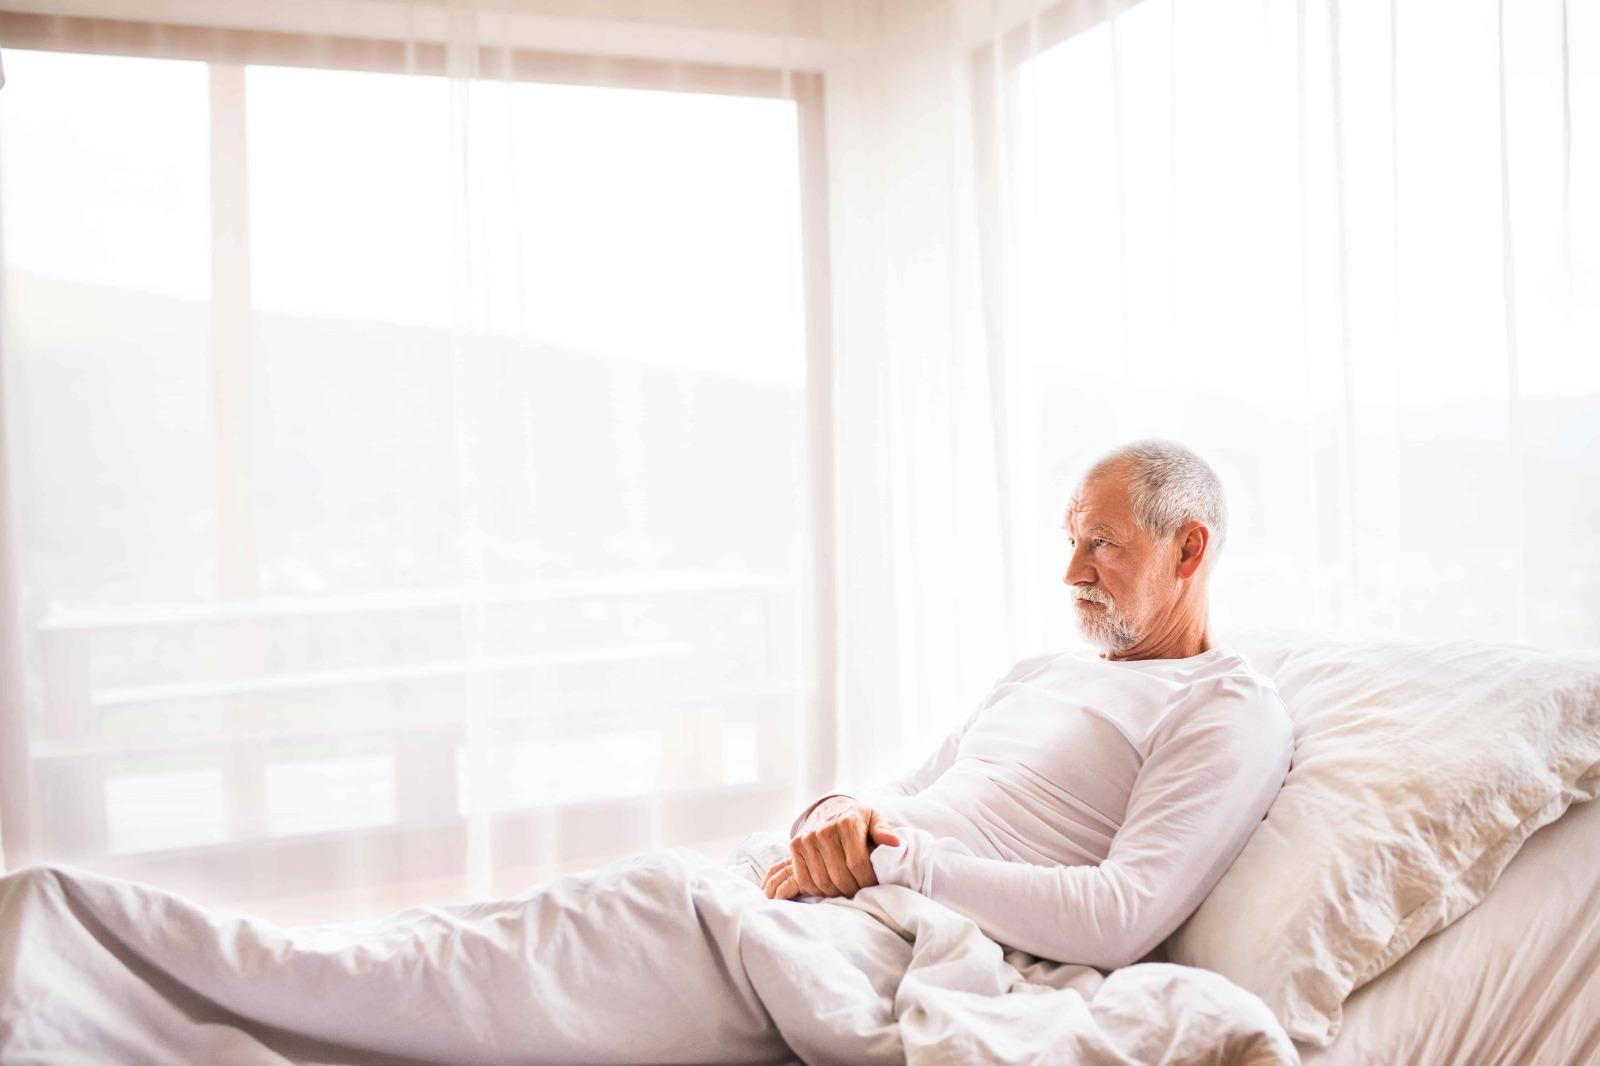 You are currently viewing ניתוח קשירת צינורות הזרע – למה משתלם לגבר לעבור ניתוח כזה?